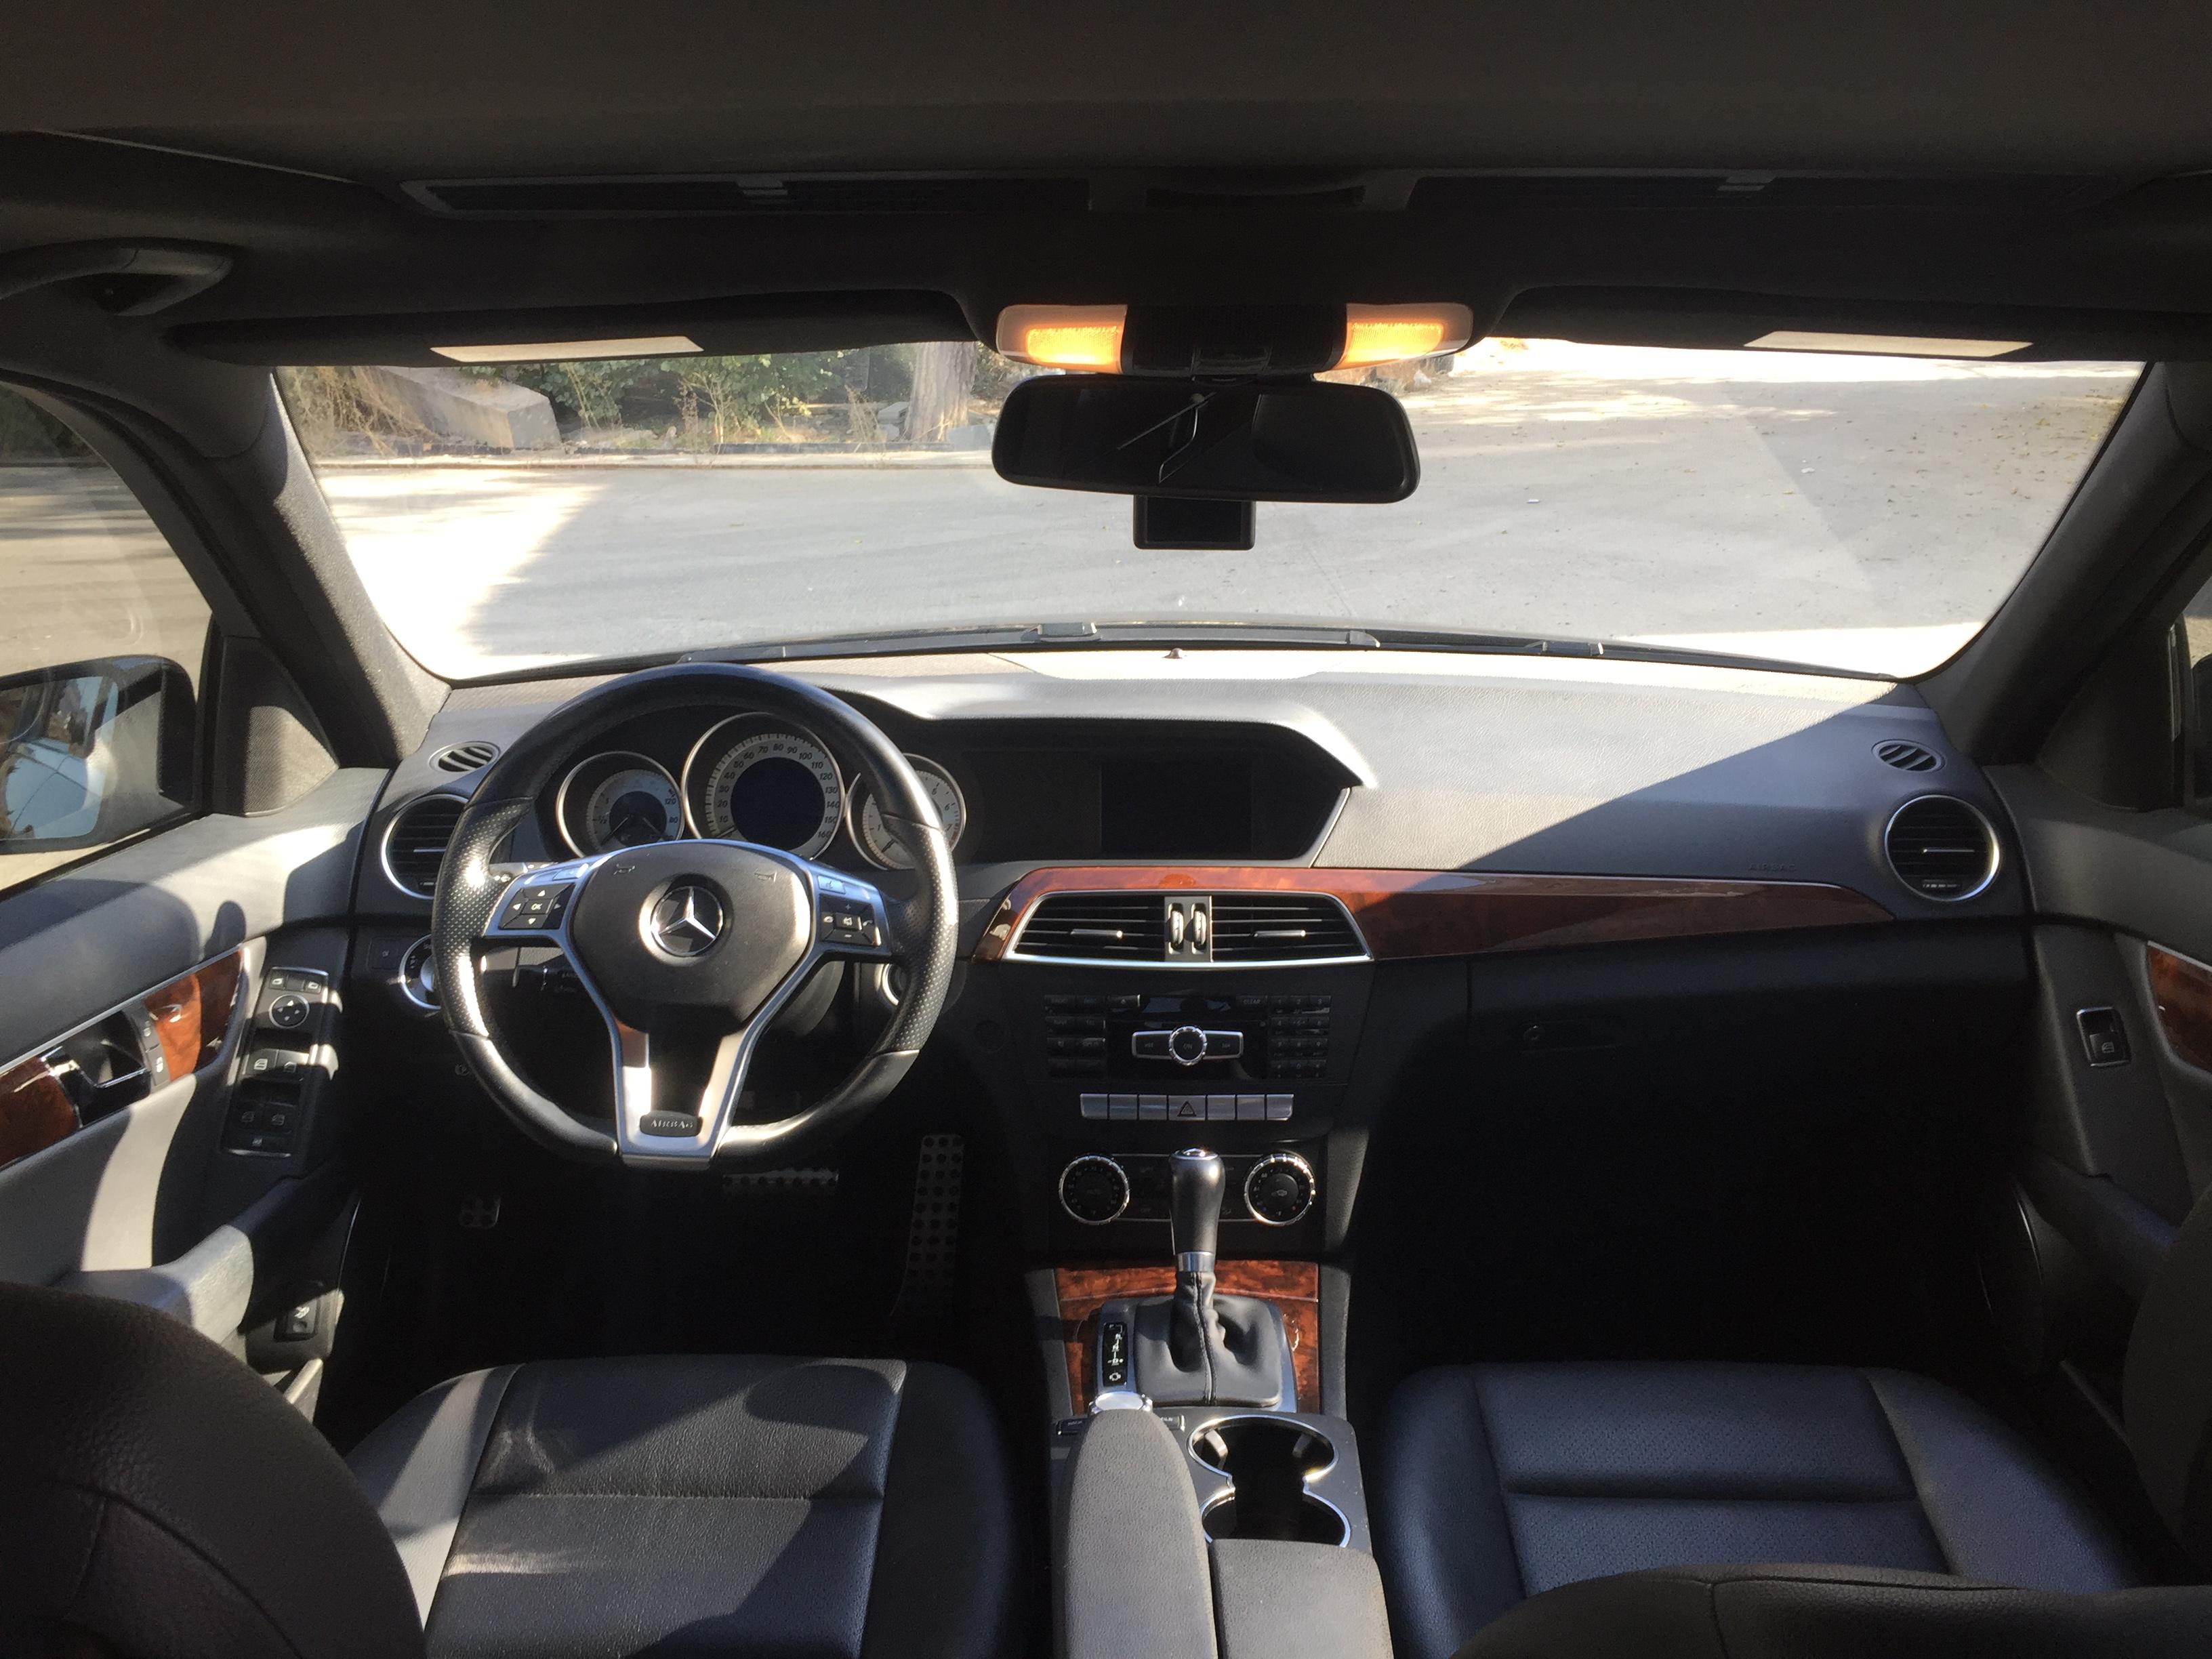 Mercedes-Benz C-class hamisi